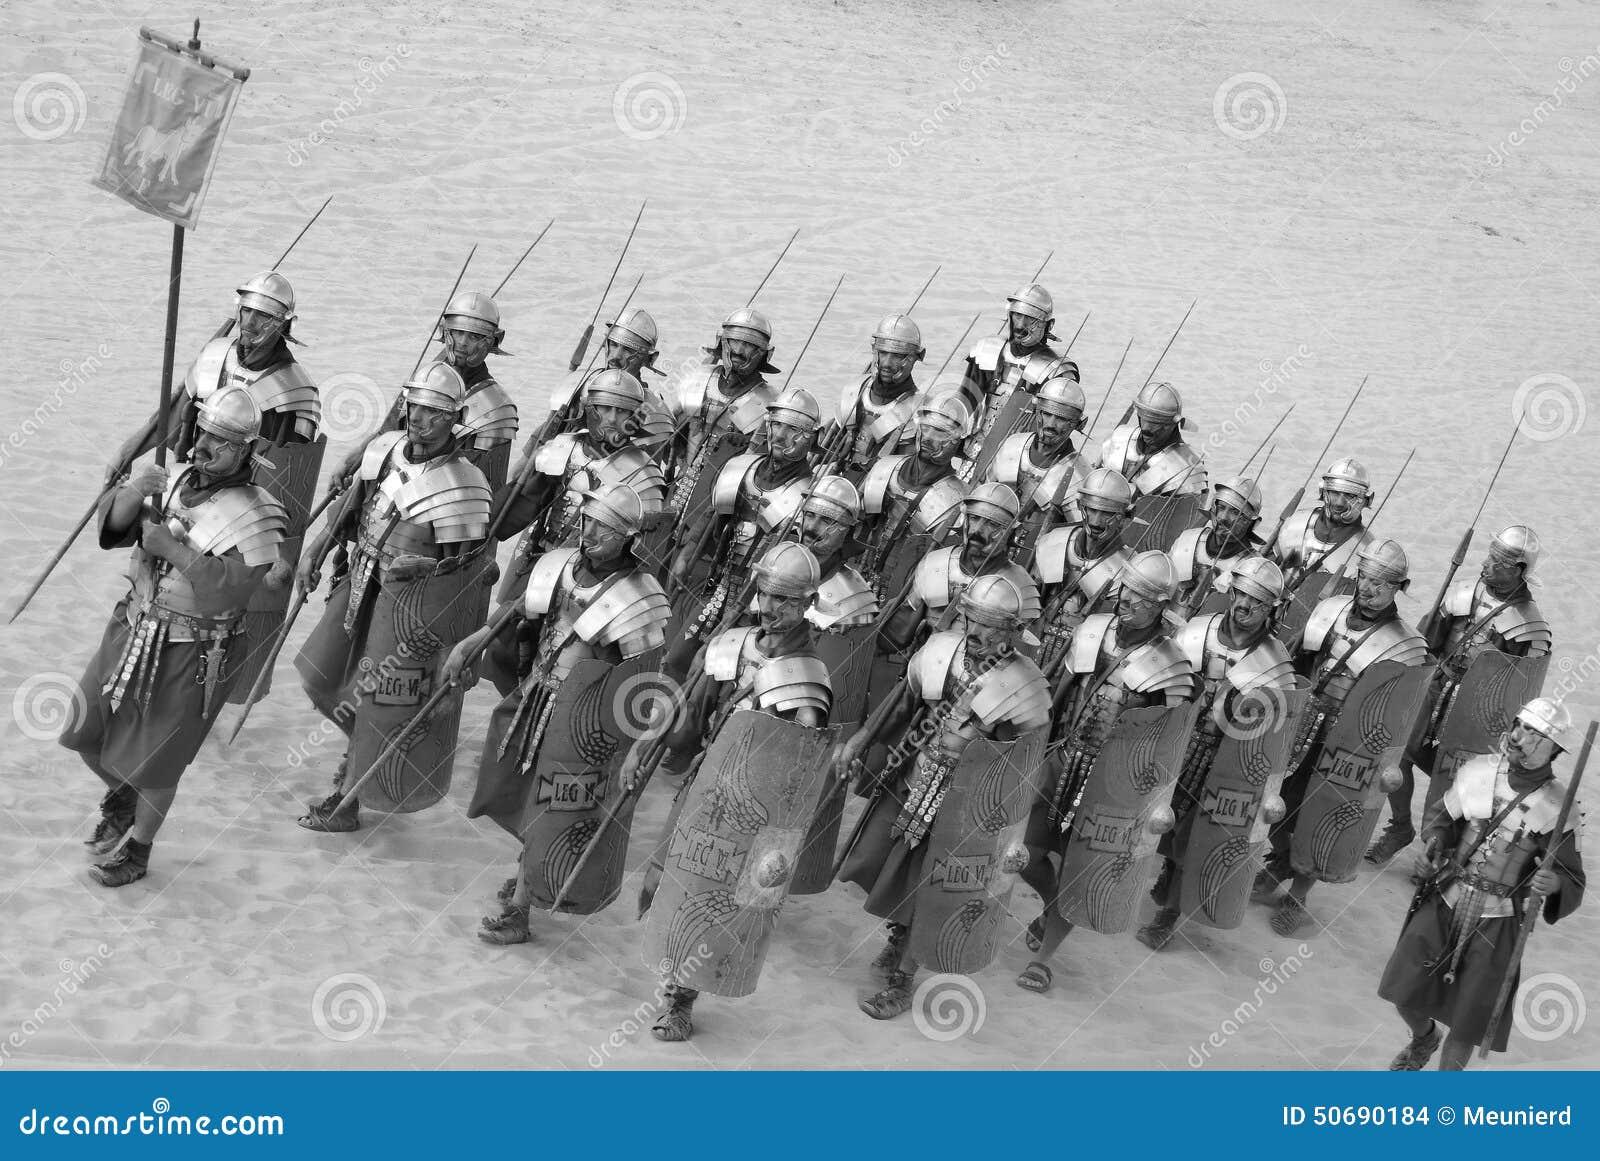 Download 作为罗马战士的约旦人礼服 编辑类库存图片. 图片 包括有 荣耀, 凯撒, 百人队队长, 纹章, 入侵, 盔甲 - 50690184